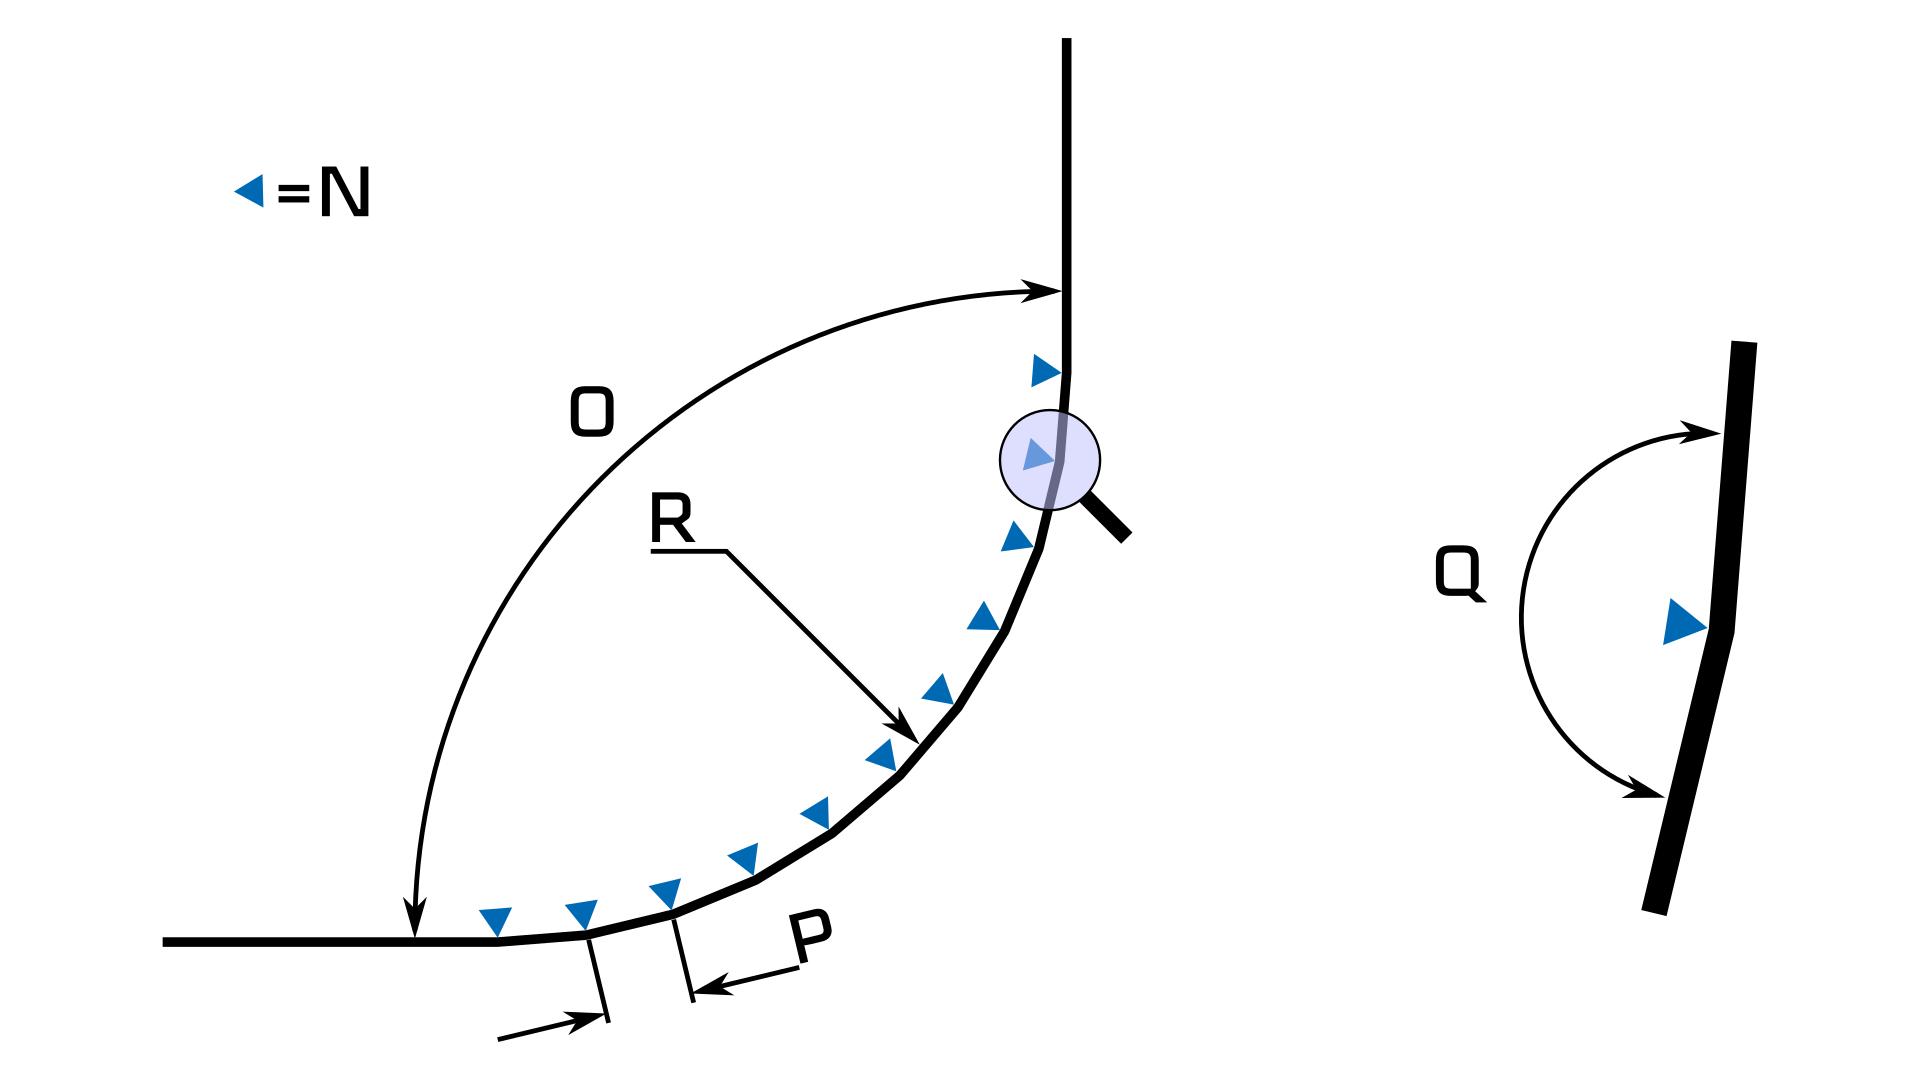 Berechnung der radialen Biegung mehrstufiges Biegen